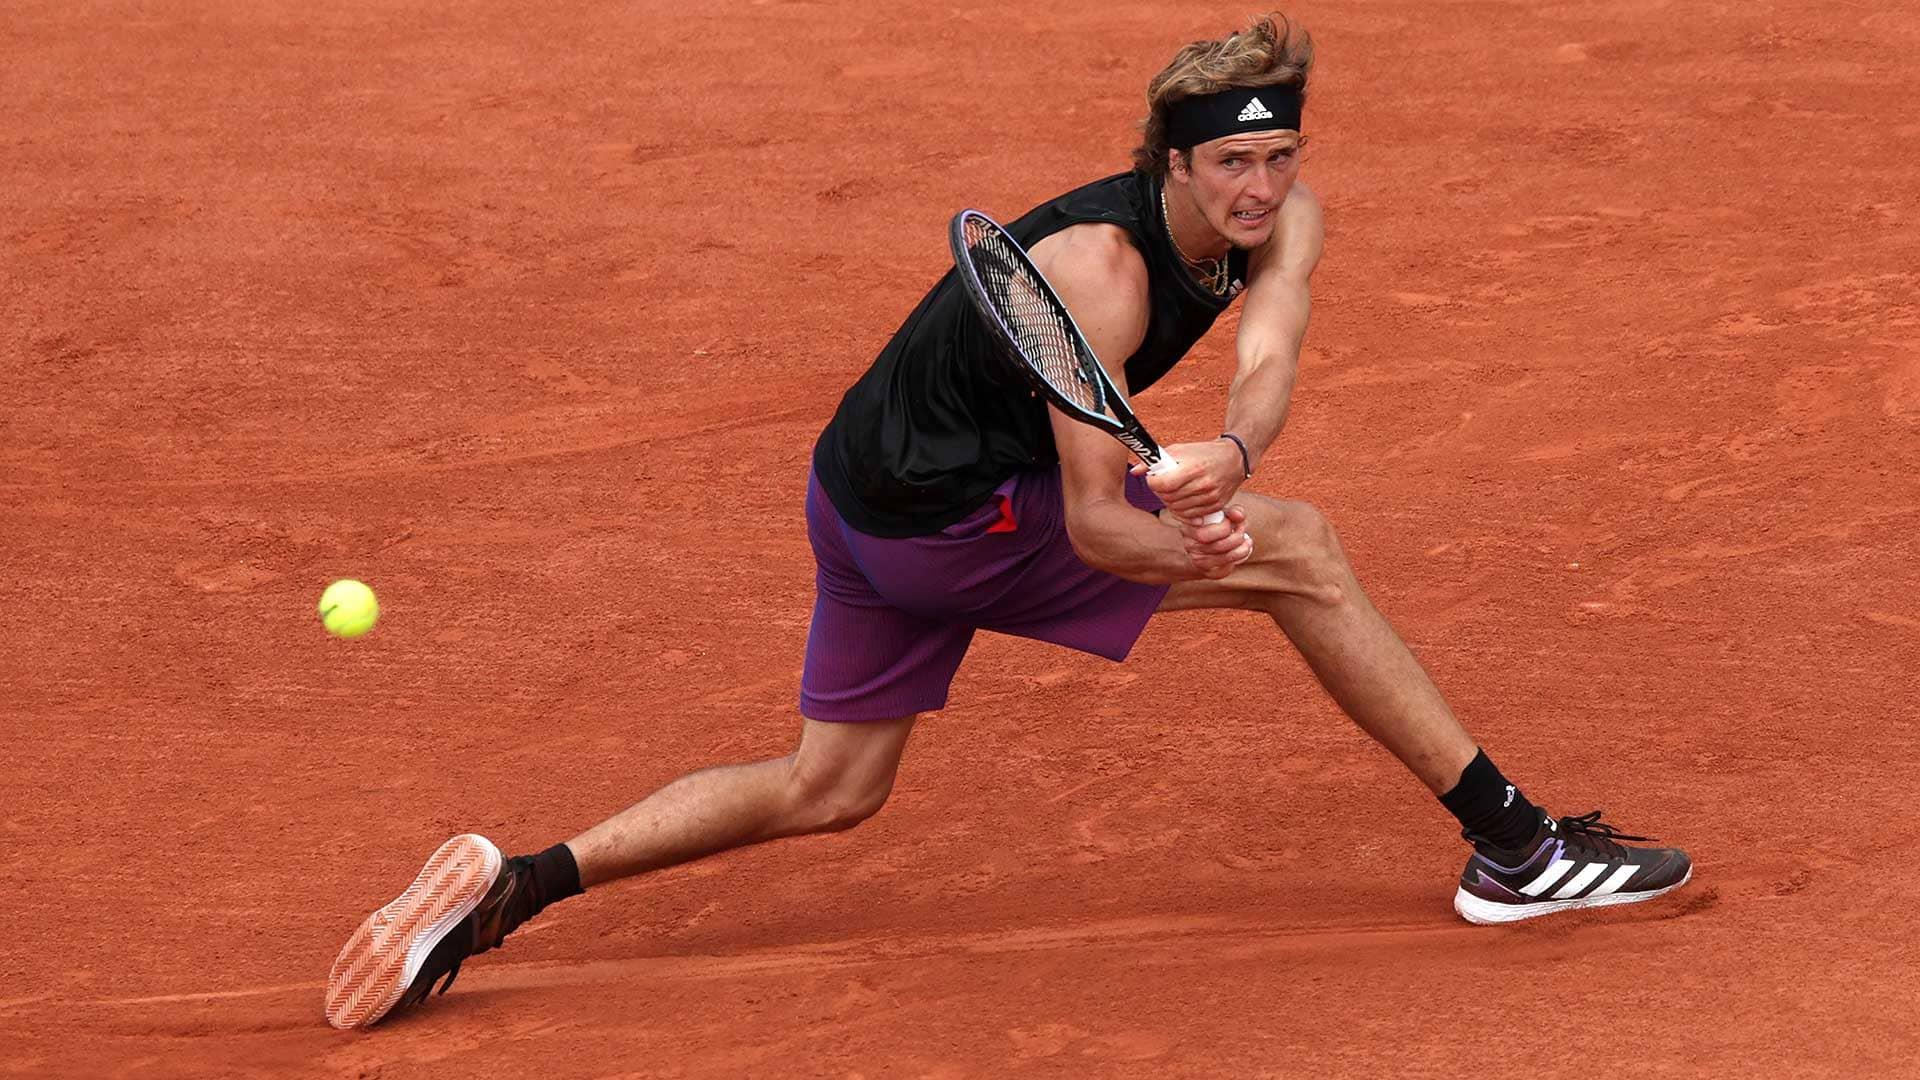 French Open 2021: Alexander Zverev vs. Laslo Djere Tennis Pick and Prediction